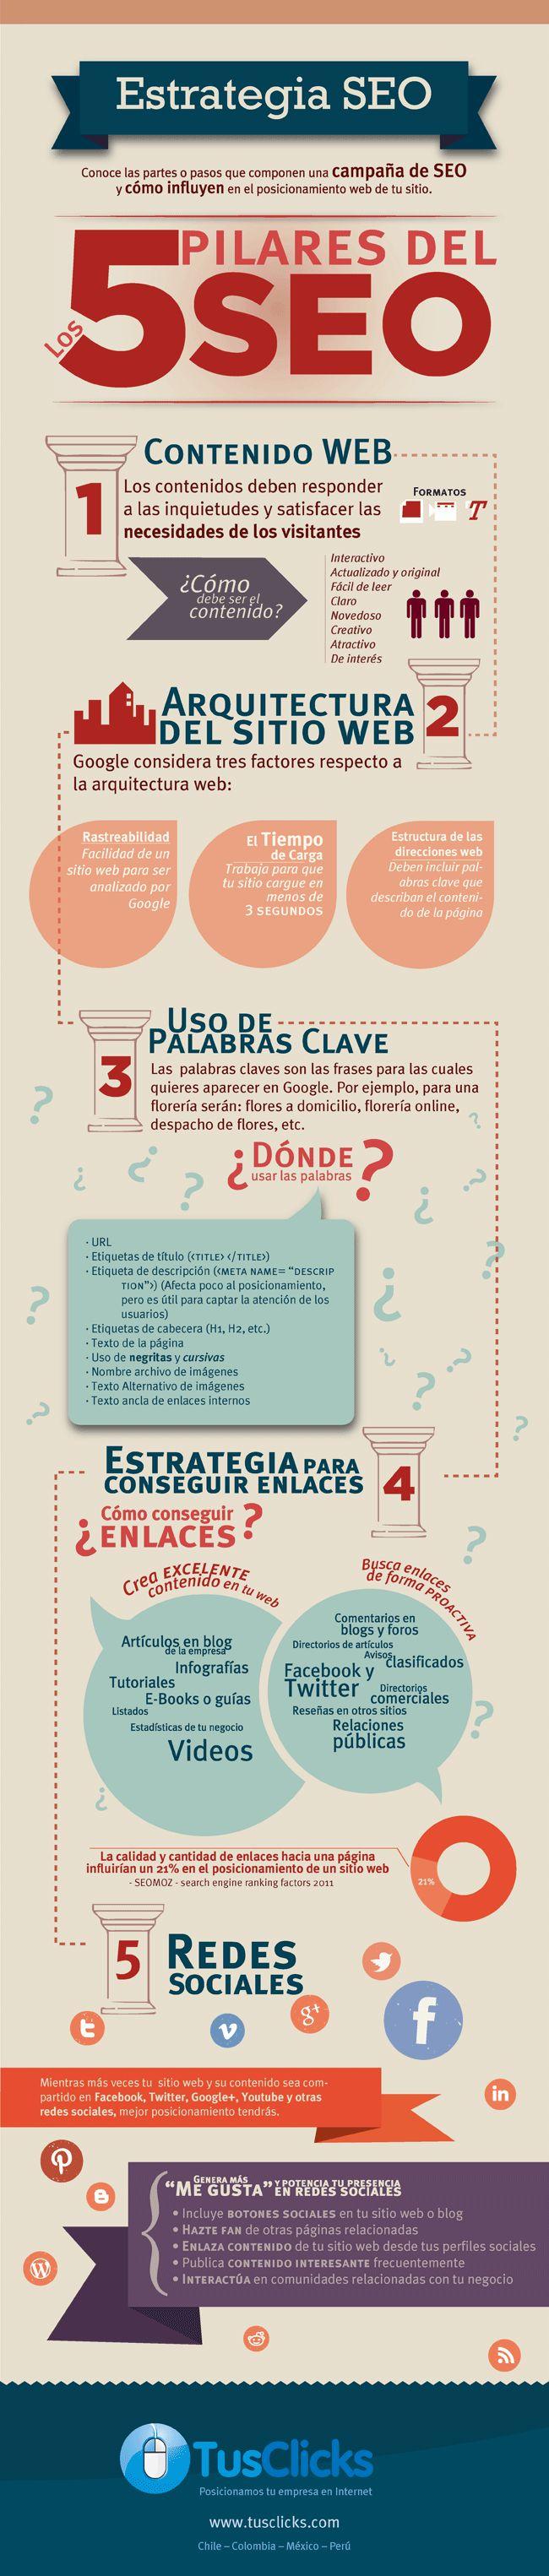 Infografía de SEO / Posicionamiento web #SEO